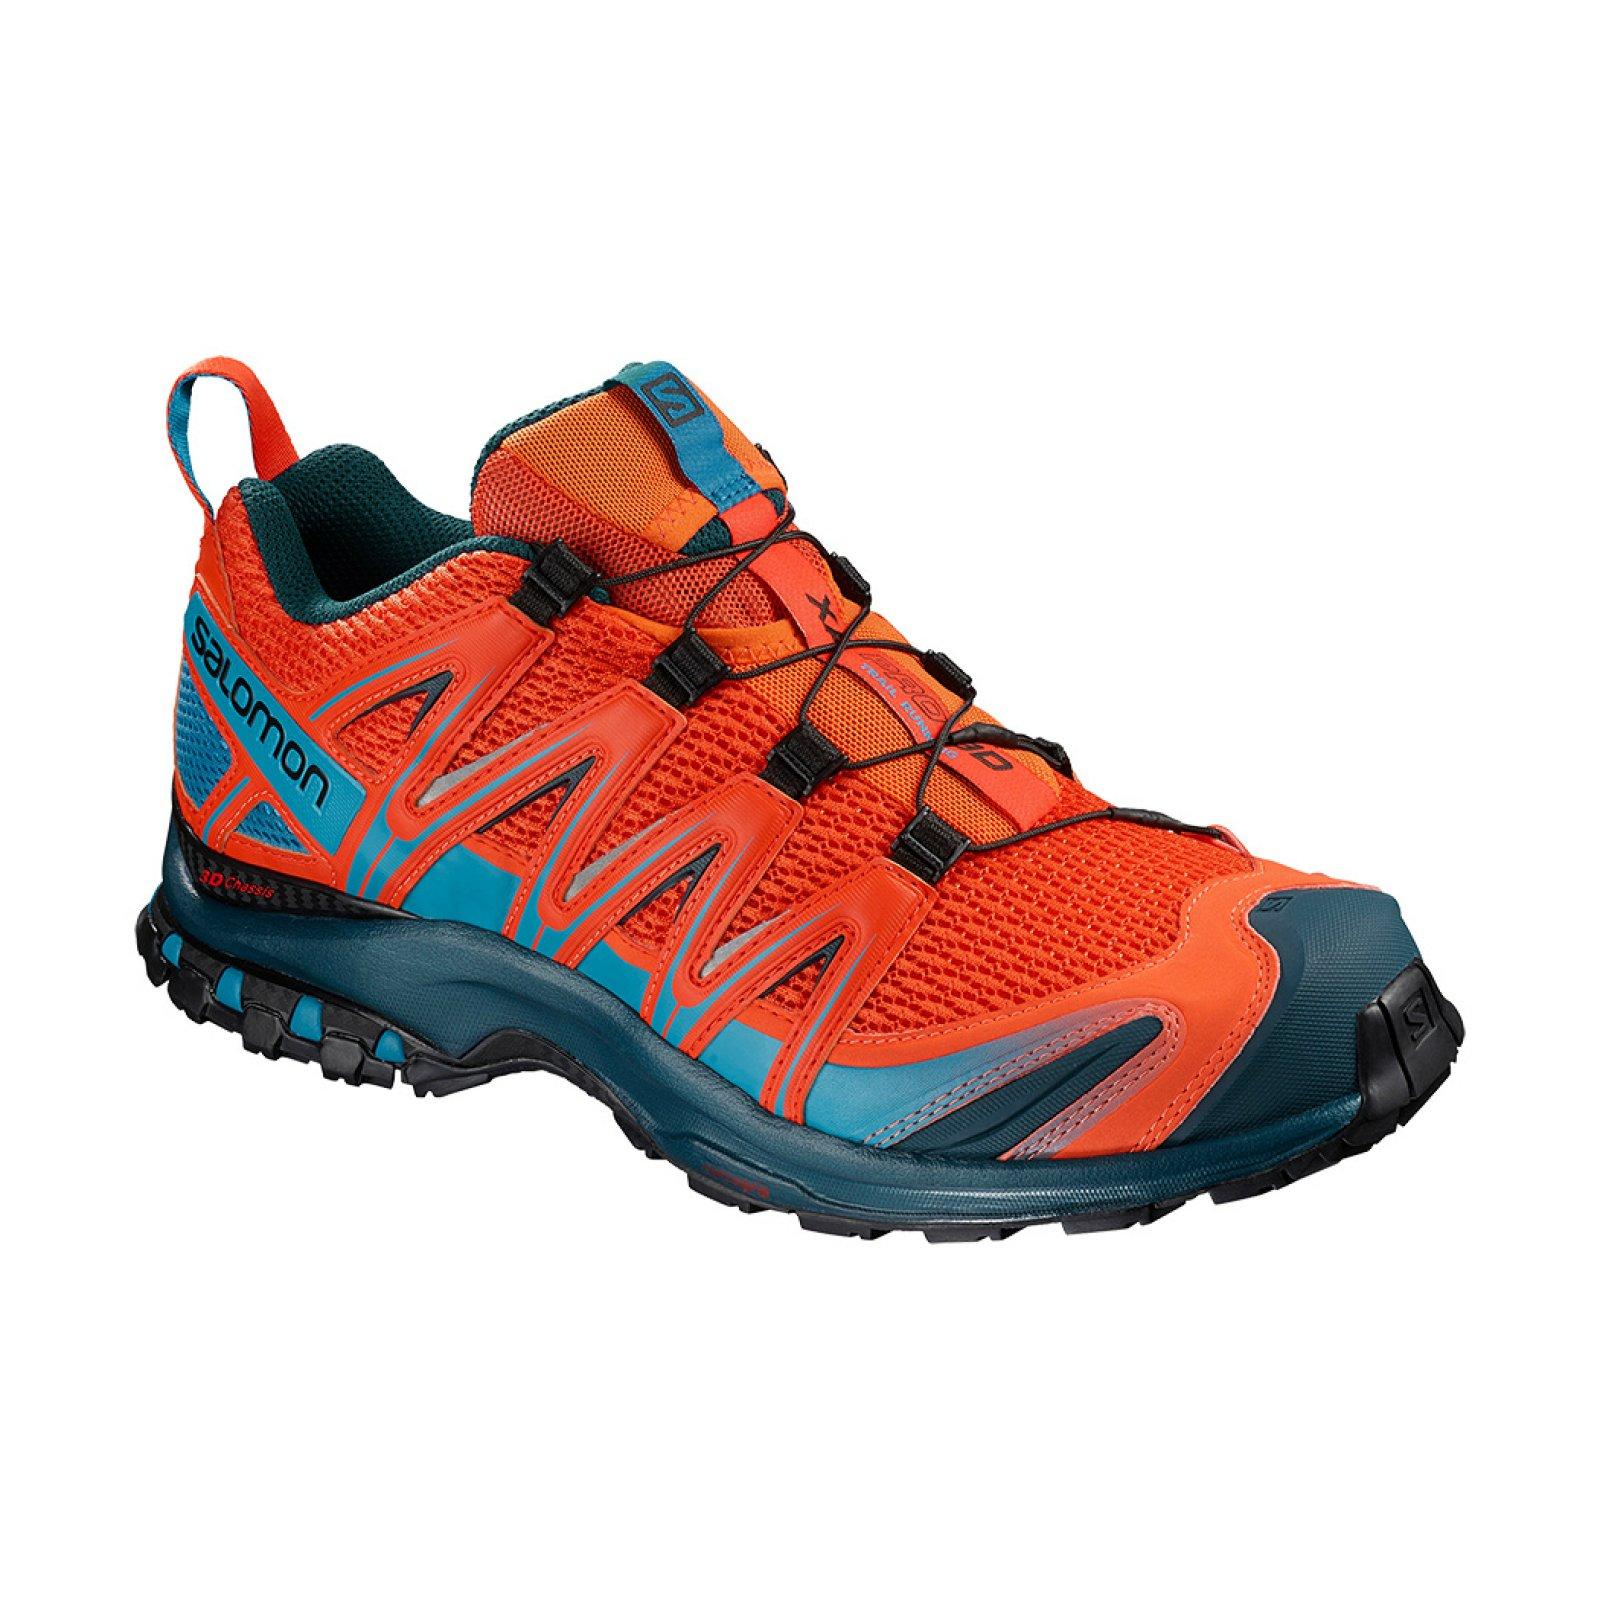 f7384f55ef7 Outdoorové trailové boty Salomon XA Pro 3D M L40471000 - Actisport.cz